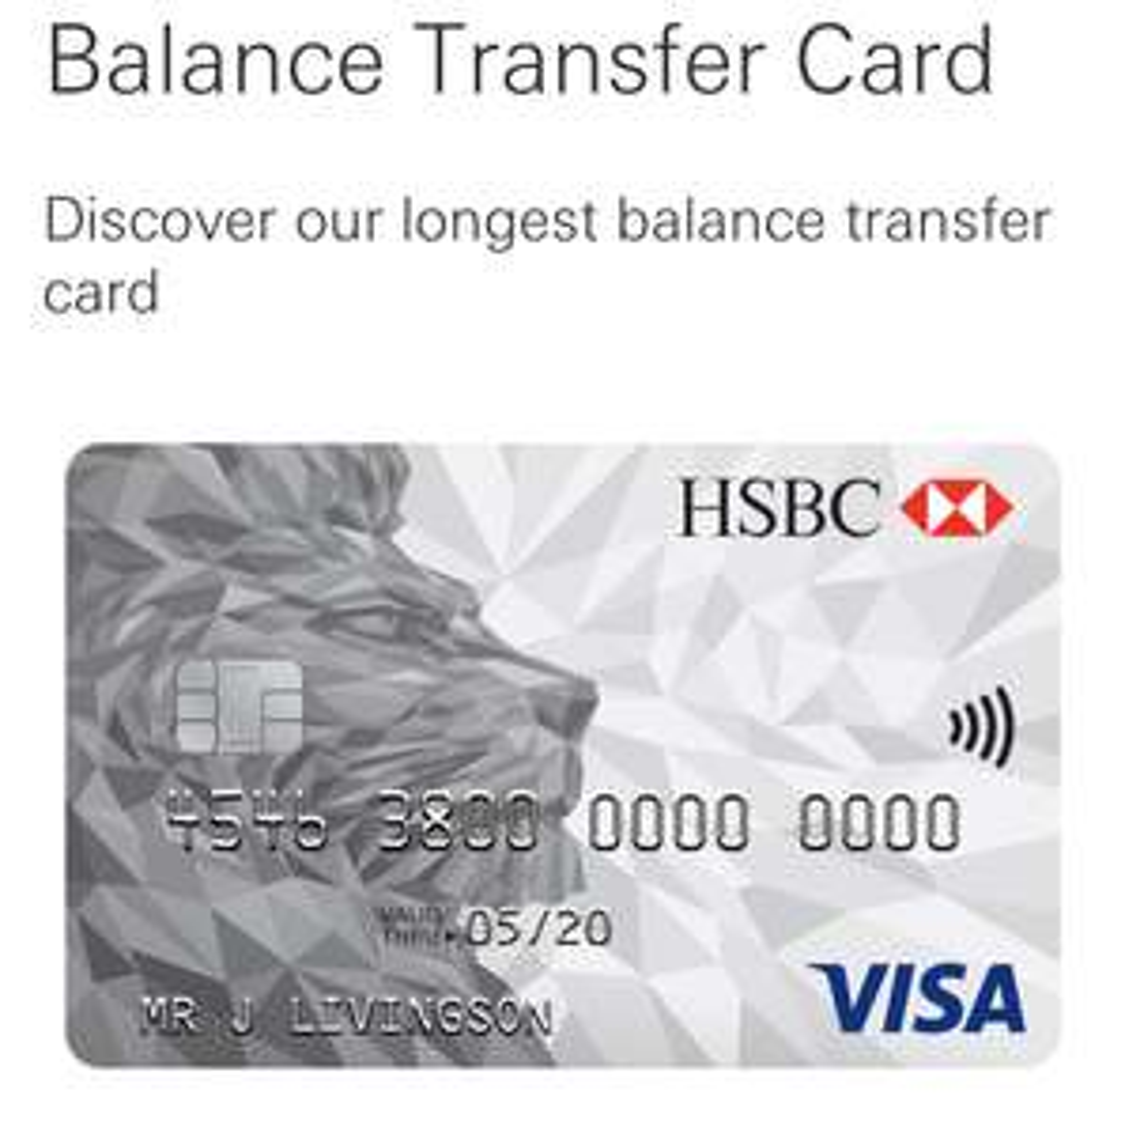 Hsbc - 32 months BT Credit Card + £25 cashback